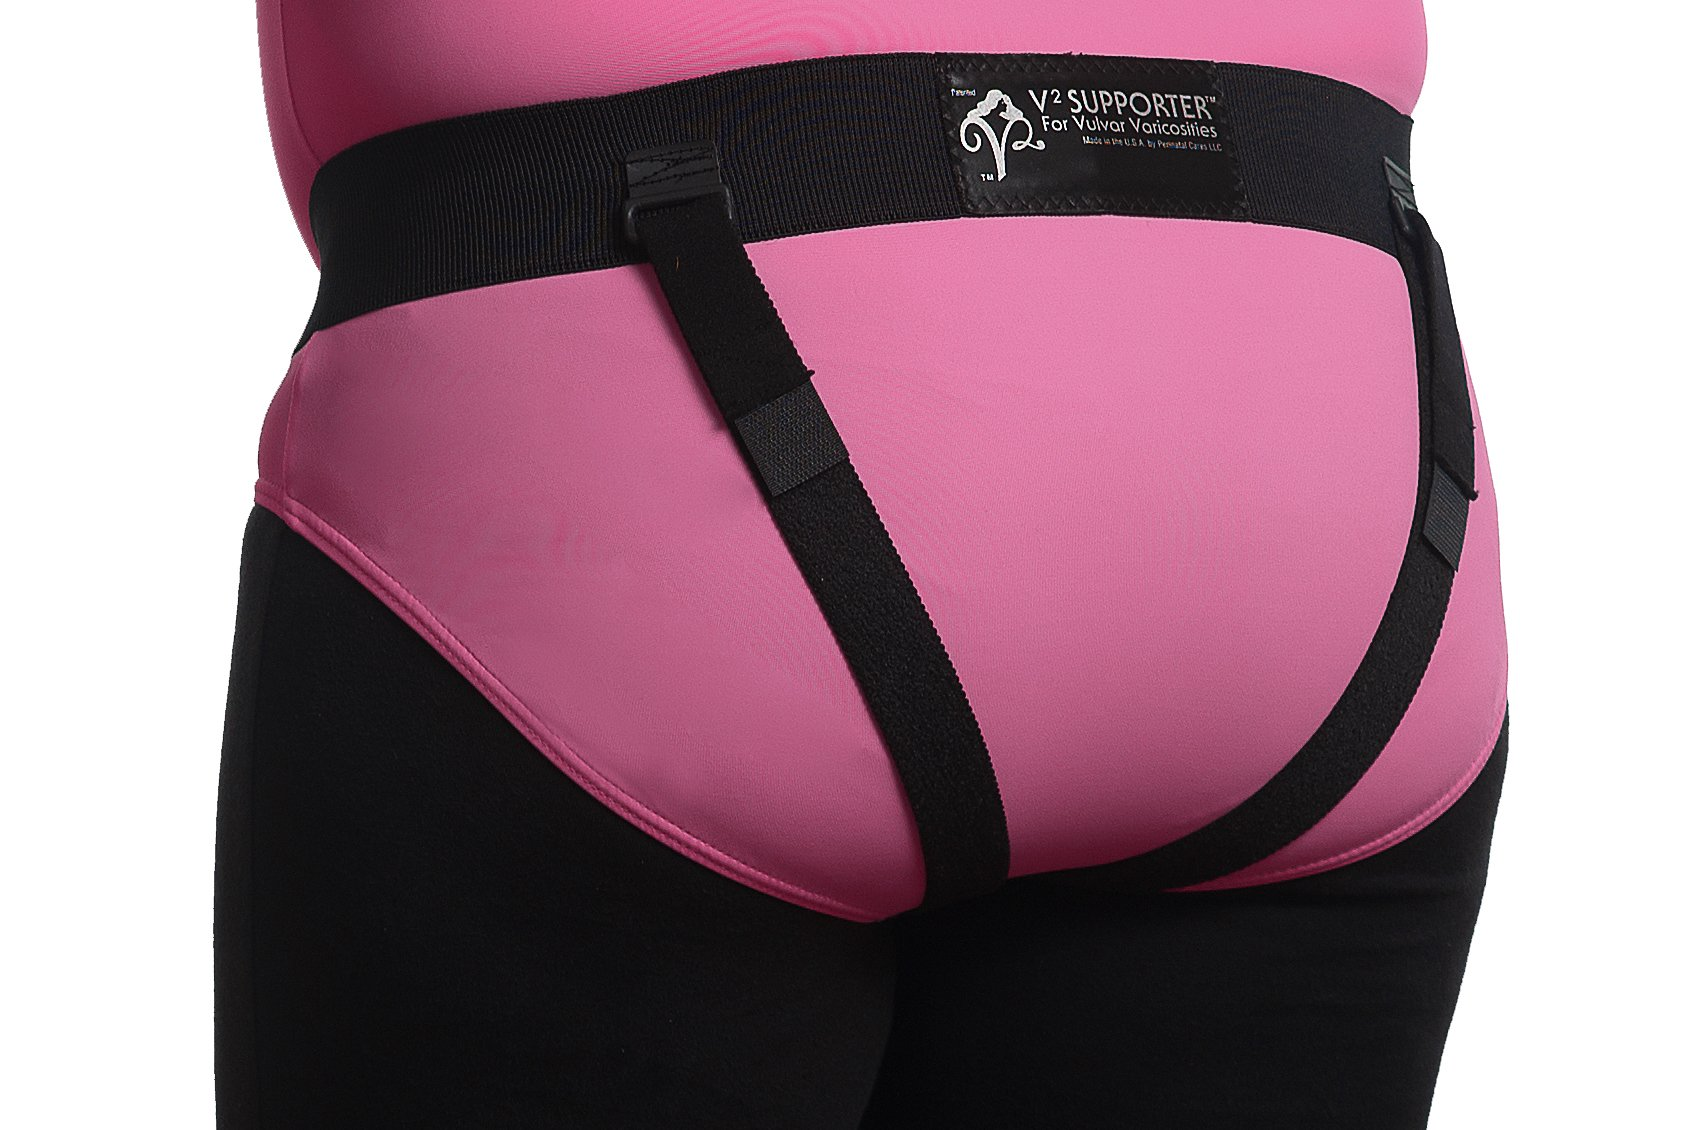 Prenatal Cradle Brand V2 Supporter Small, Black by Perinatal Cares